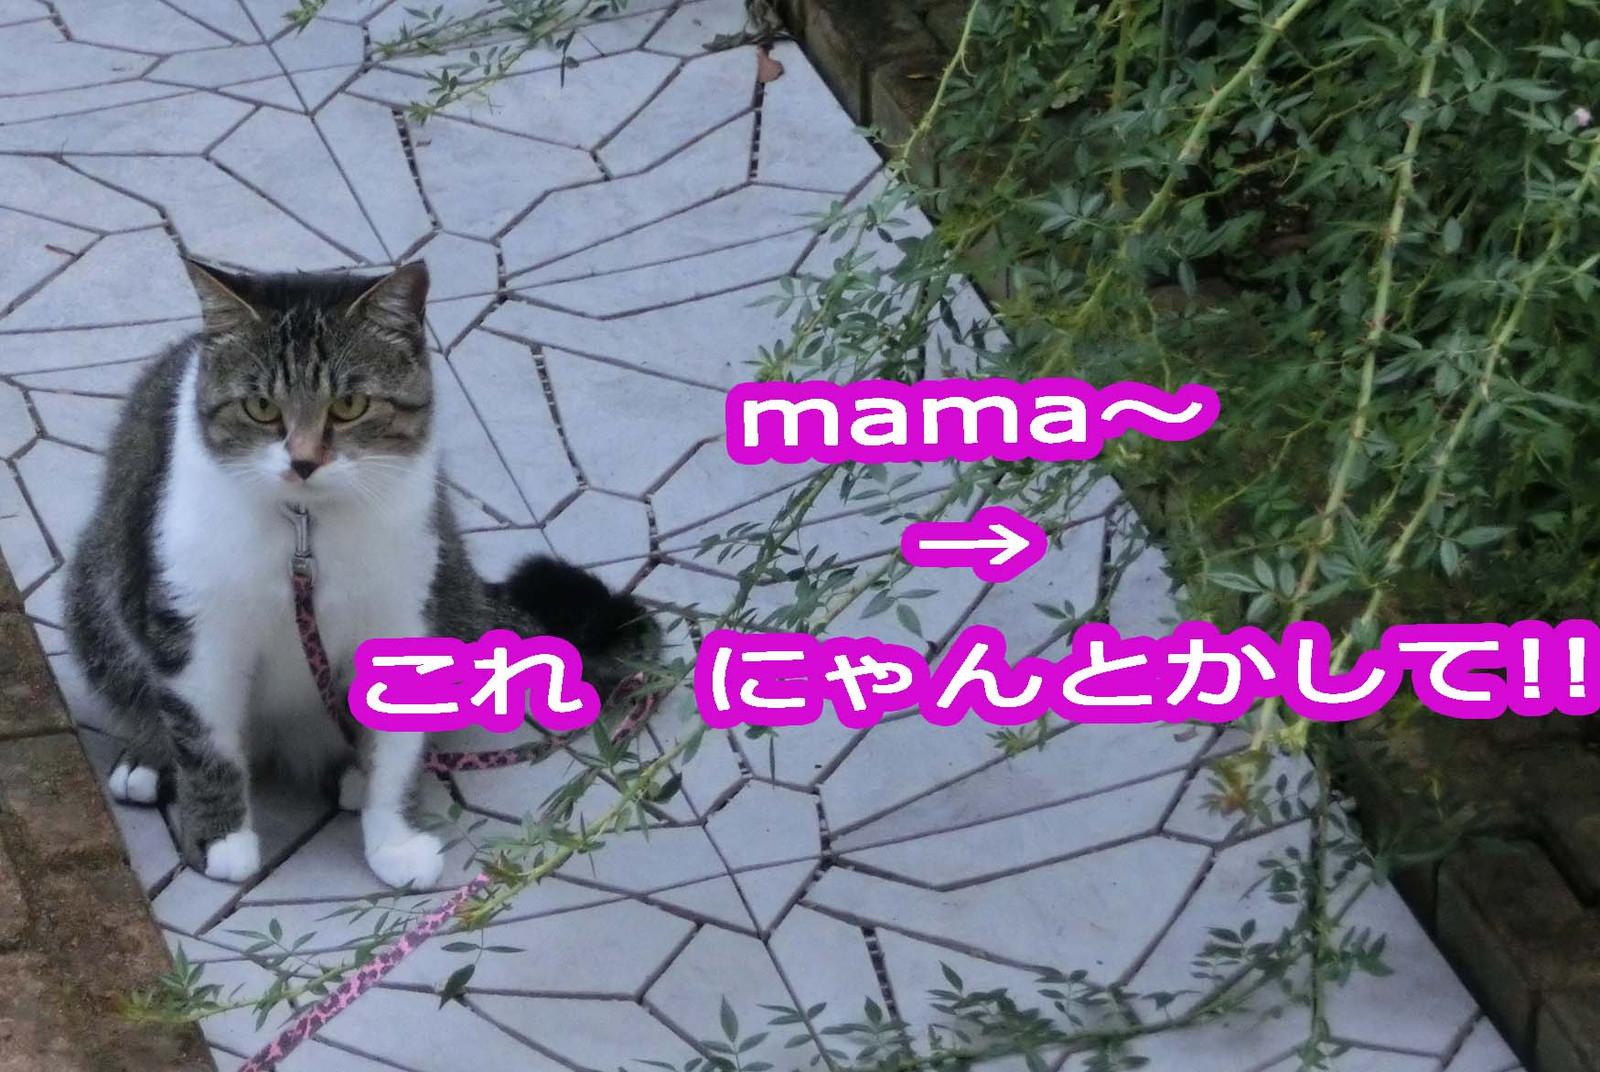 Cimg0726_edited1